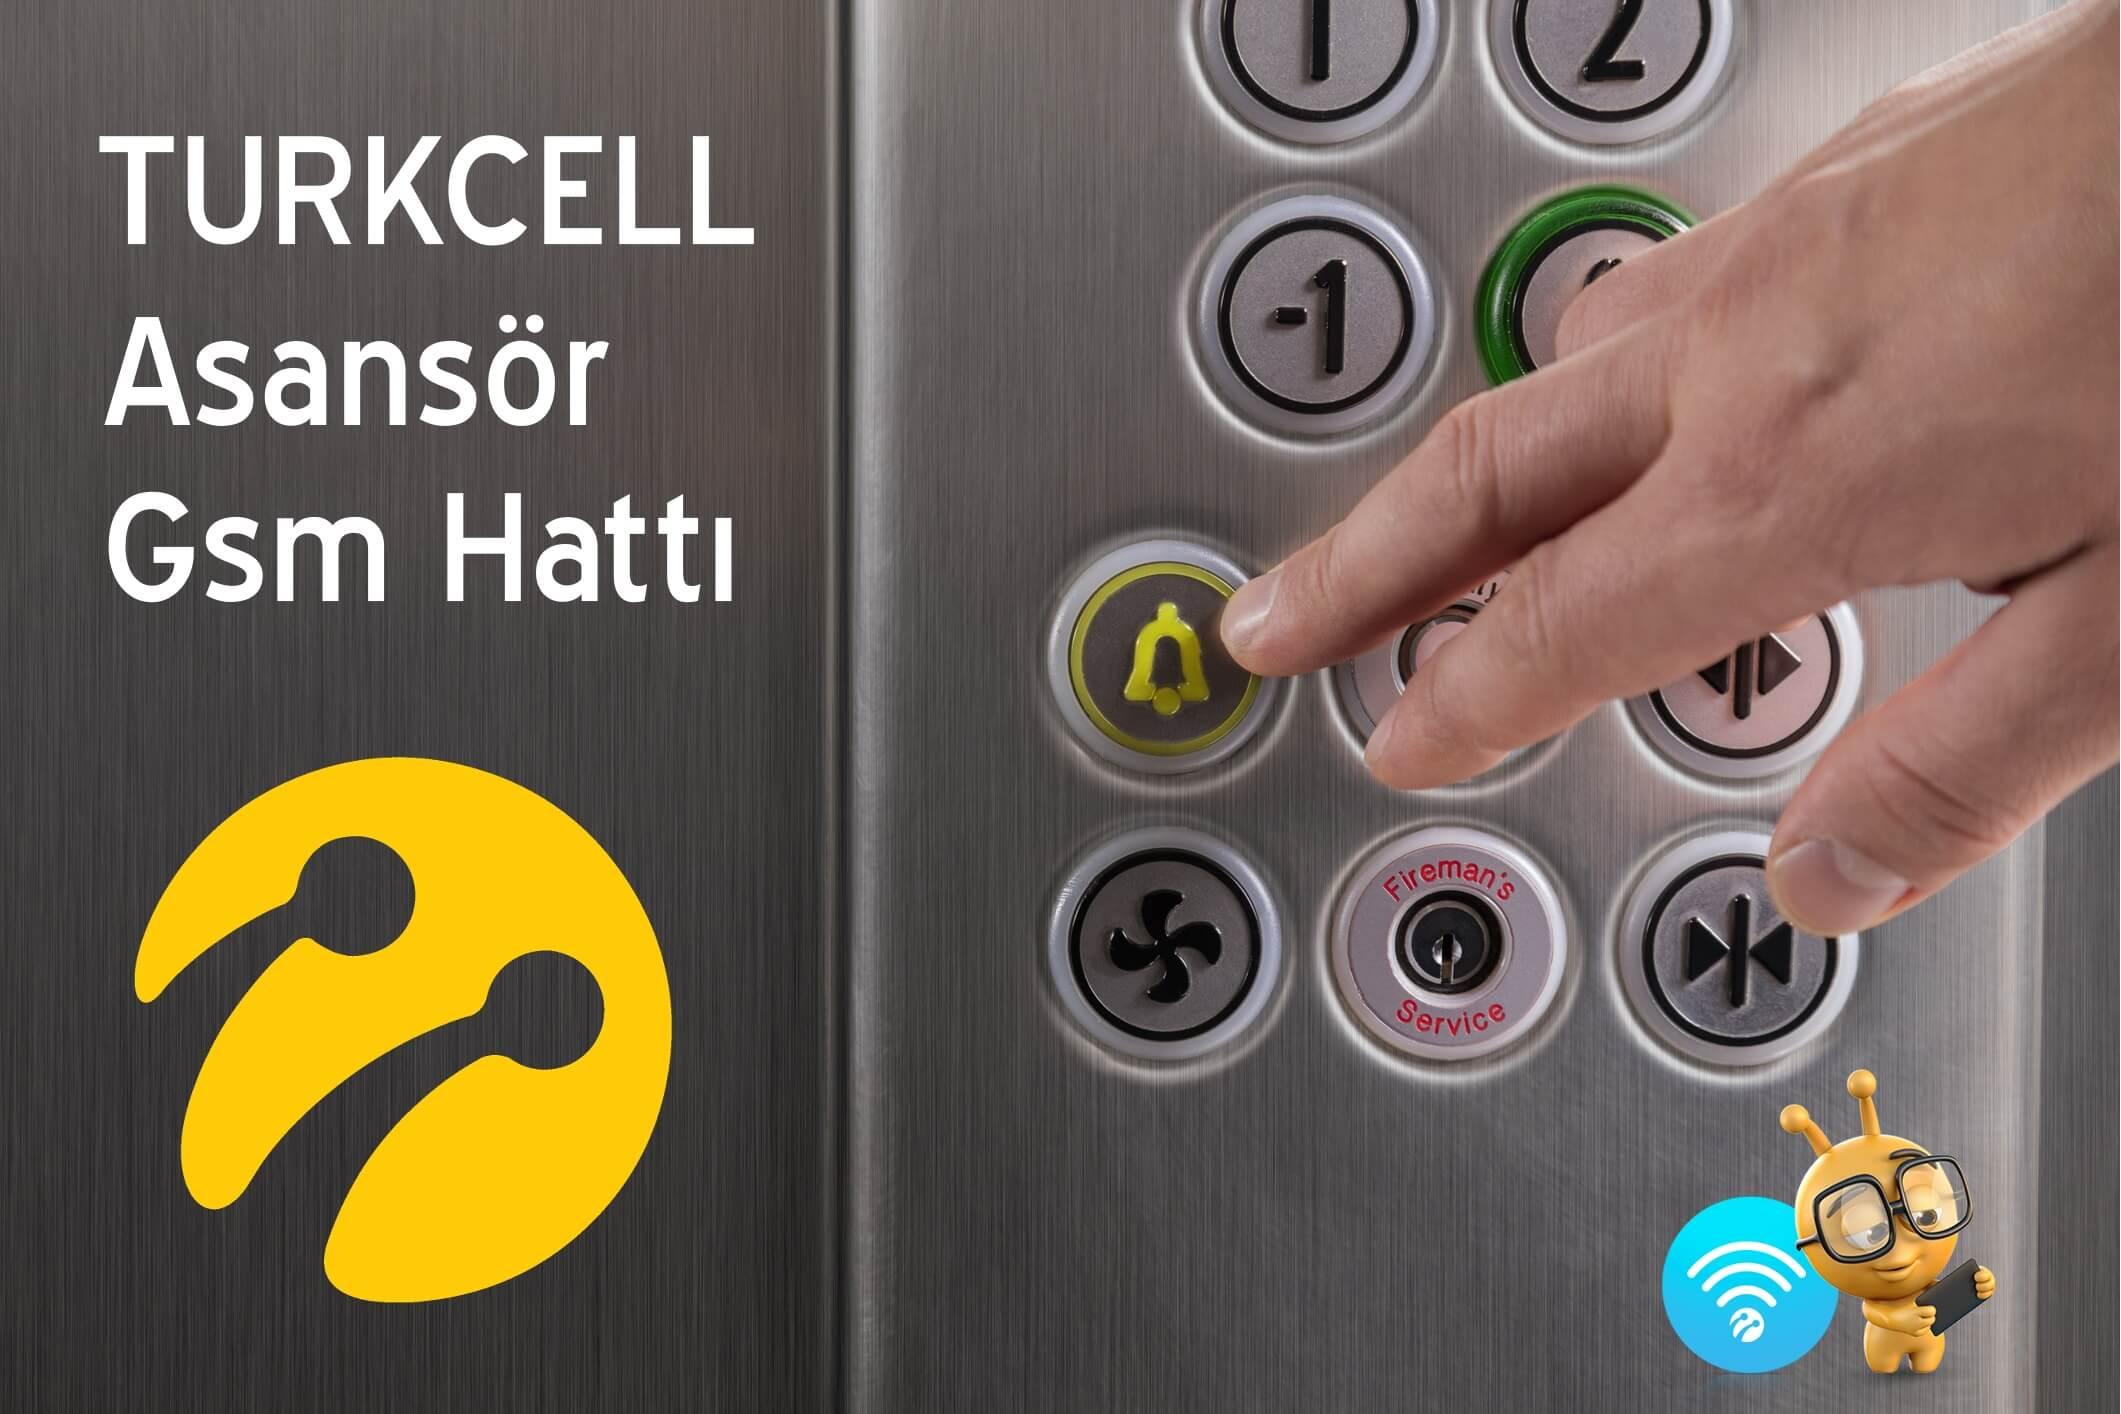 Turkcell Asansör Gsm Hattı